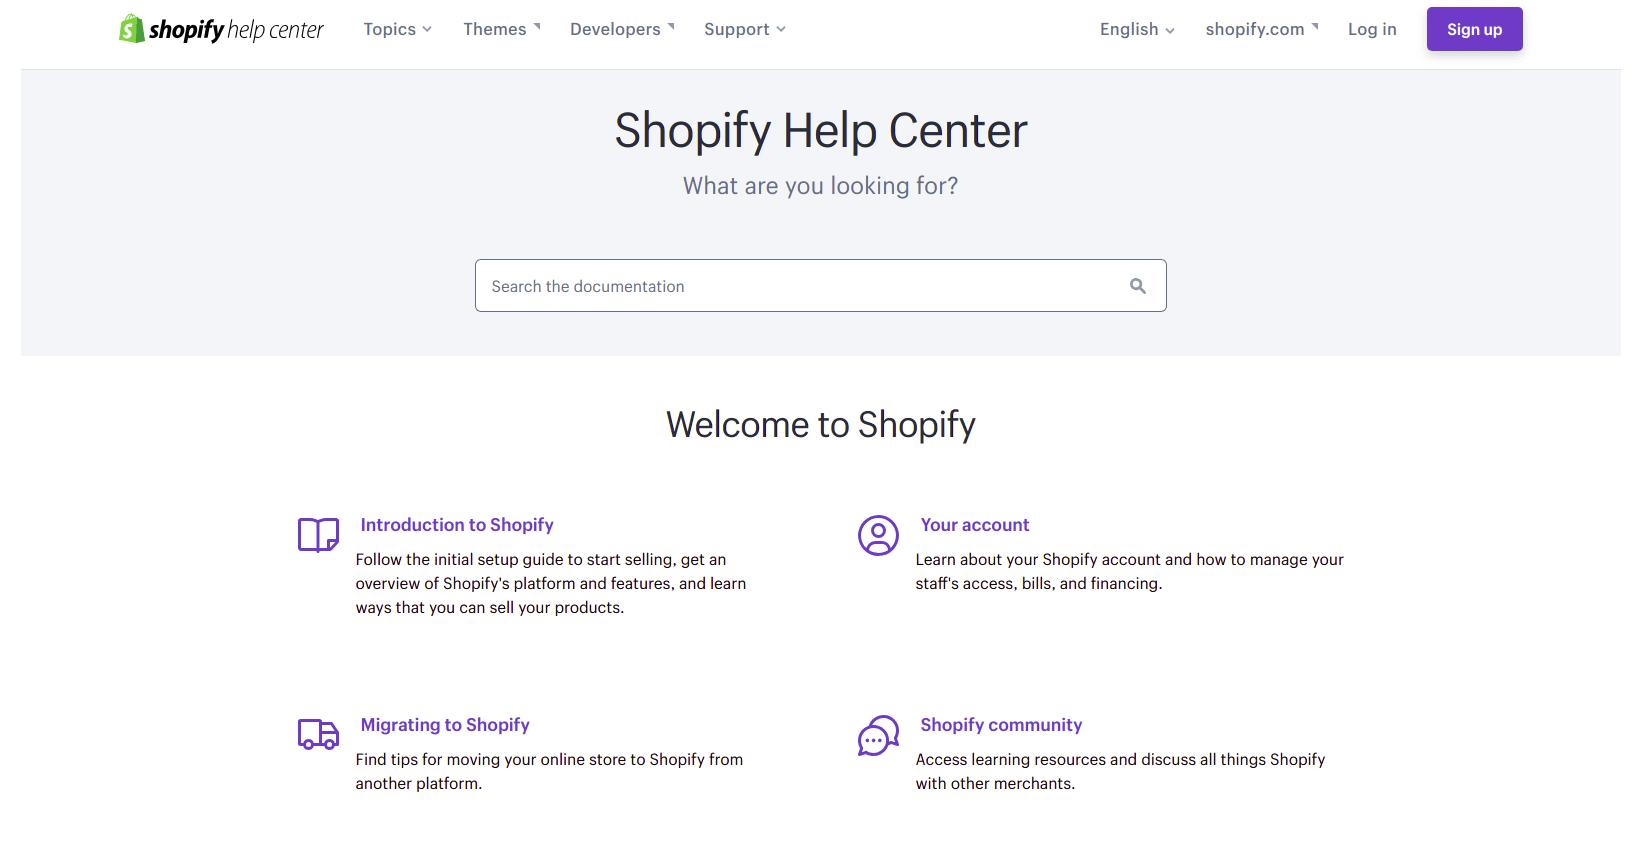 Shopify help center